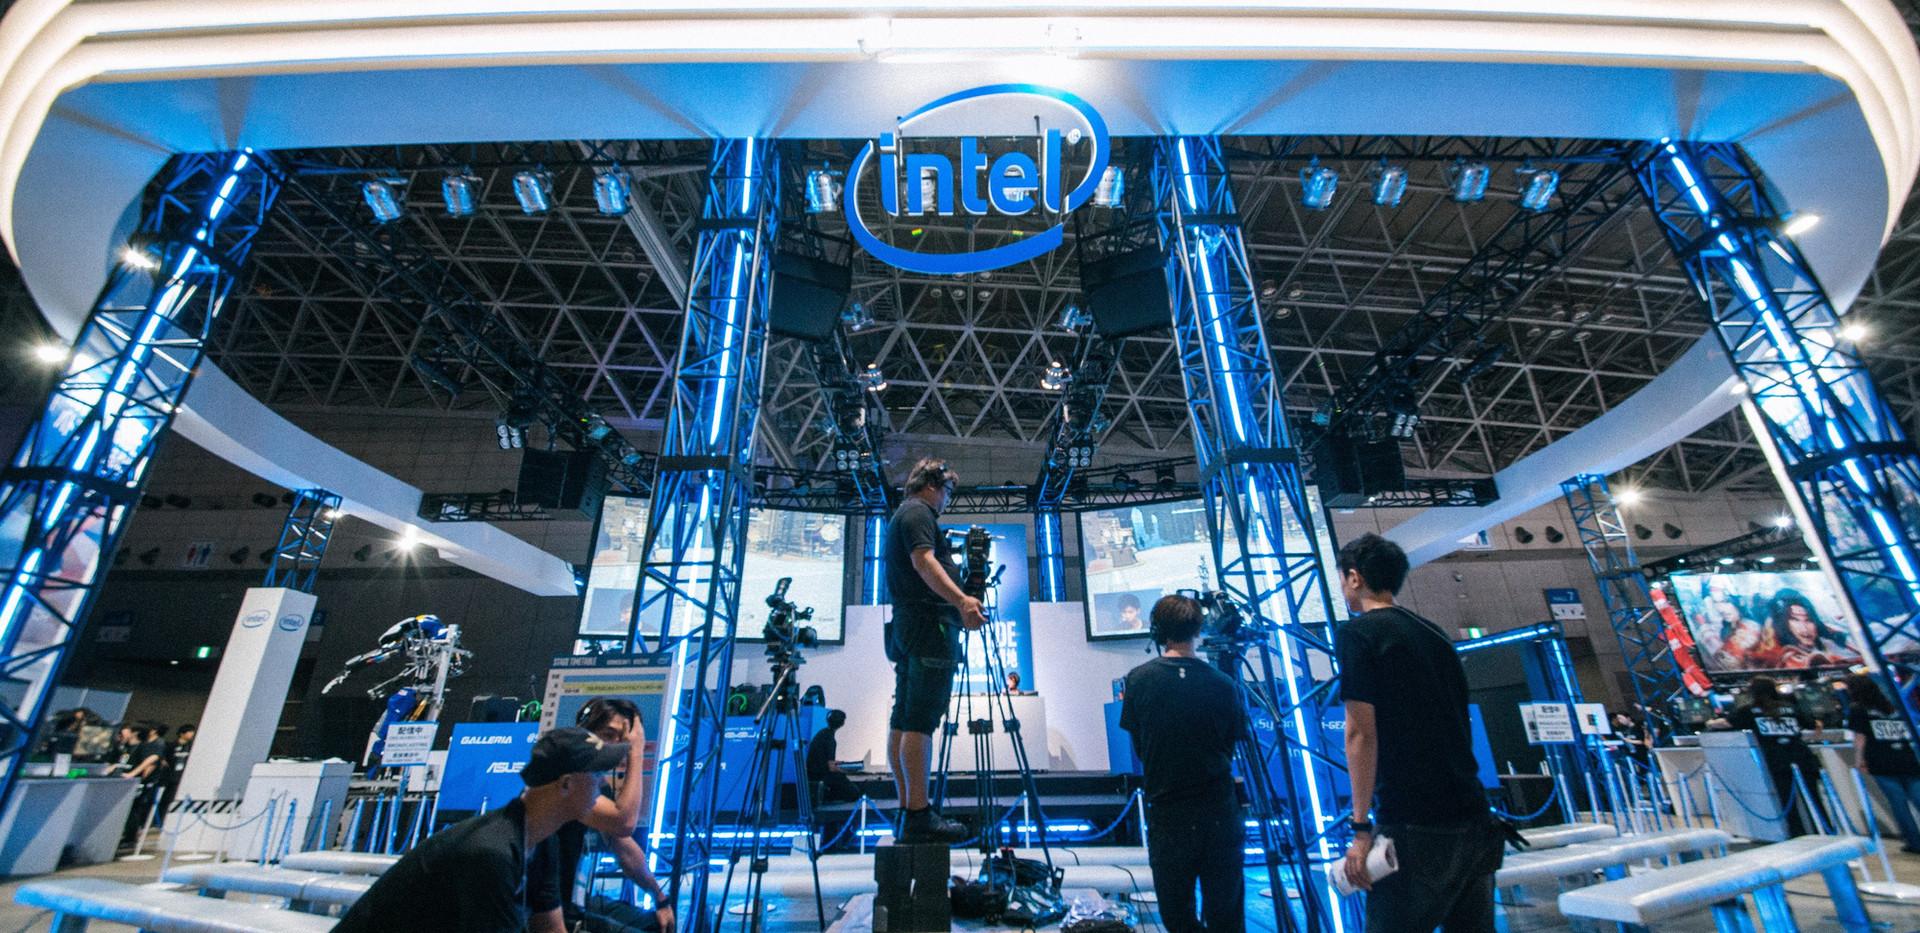 201609_TokyoGameShow_Intel.JPG.jpg